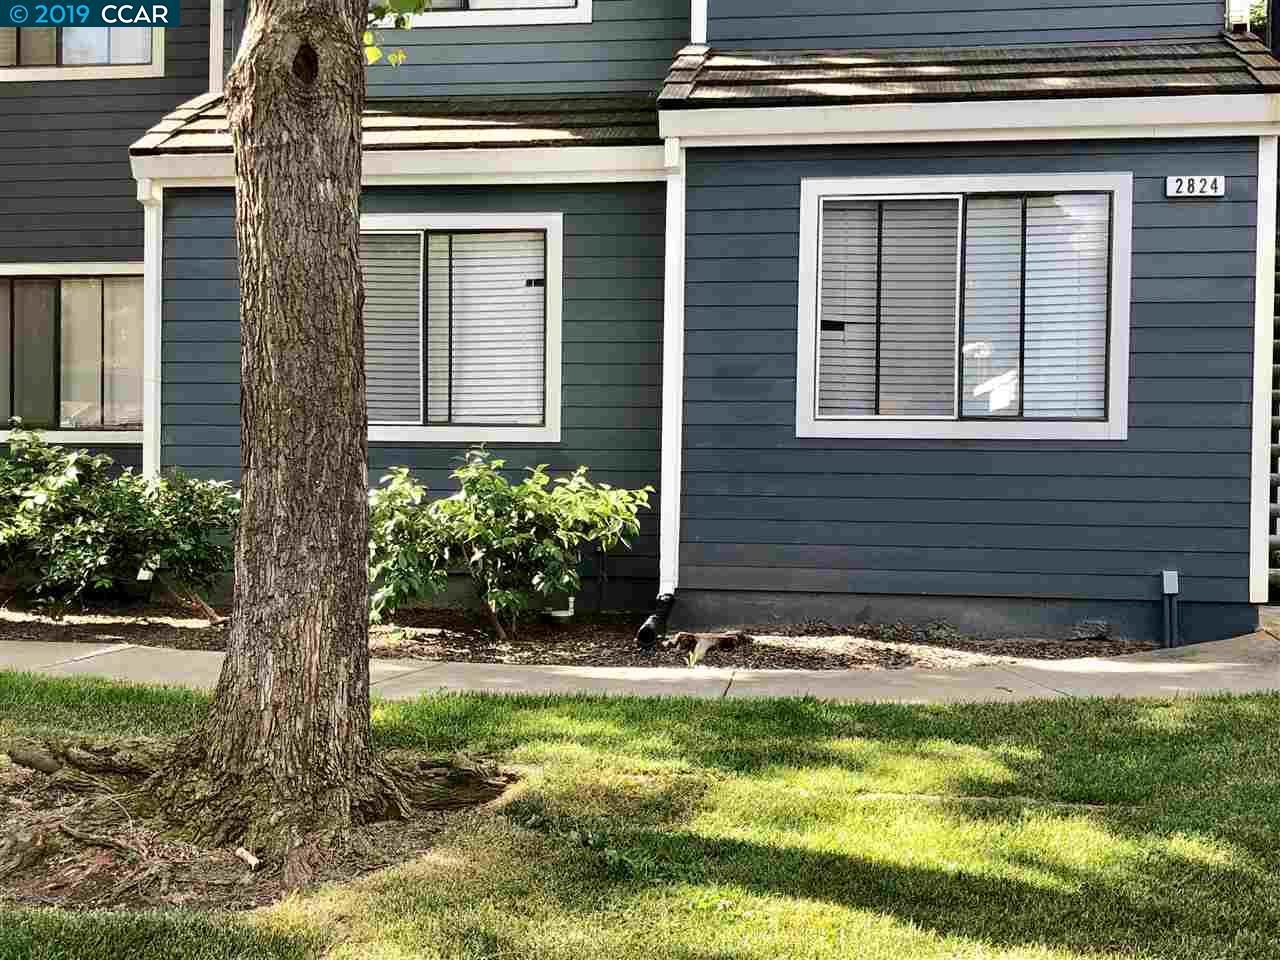 2824 Winding Ln Antioch, CA 94531